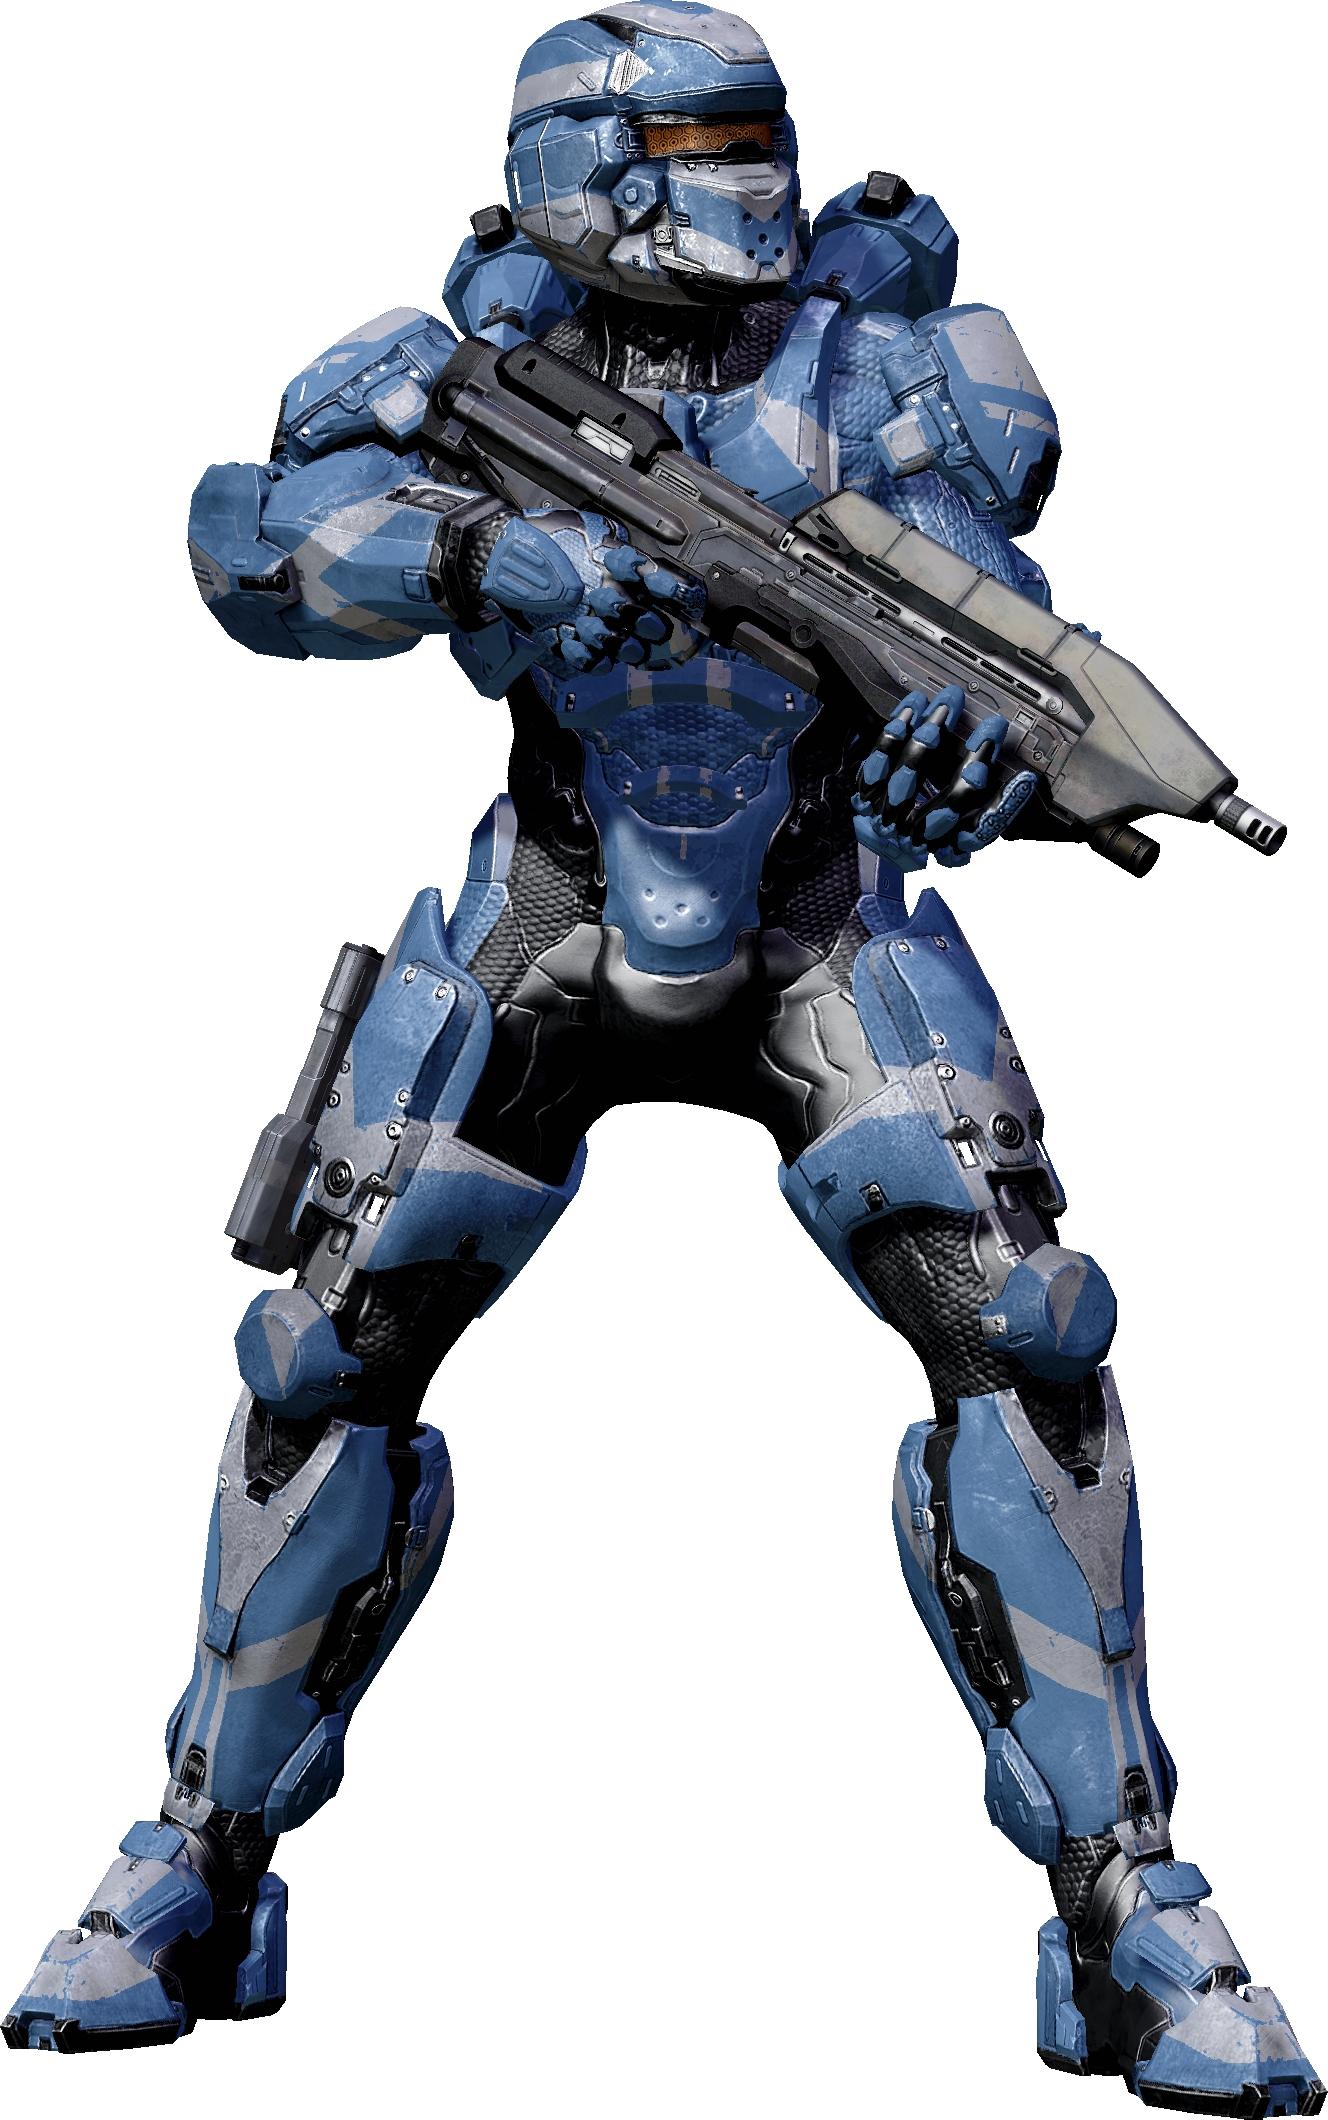 Spartan warrior | Halo | Know Your Meme